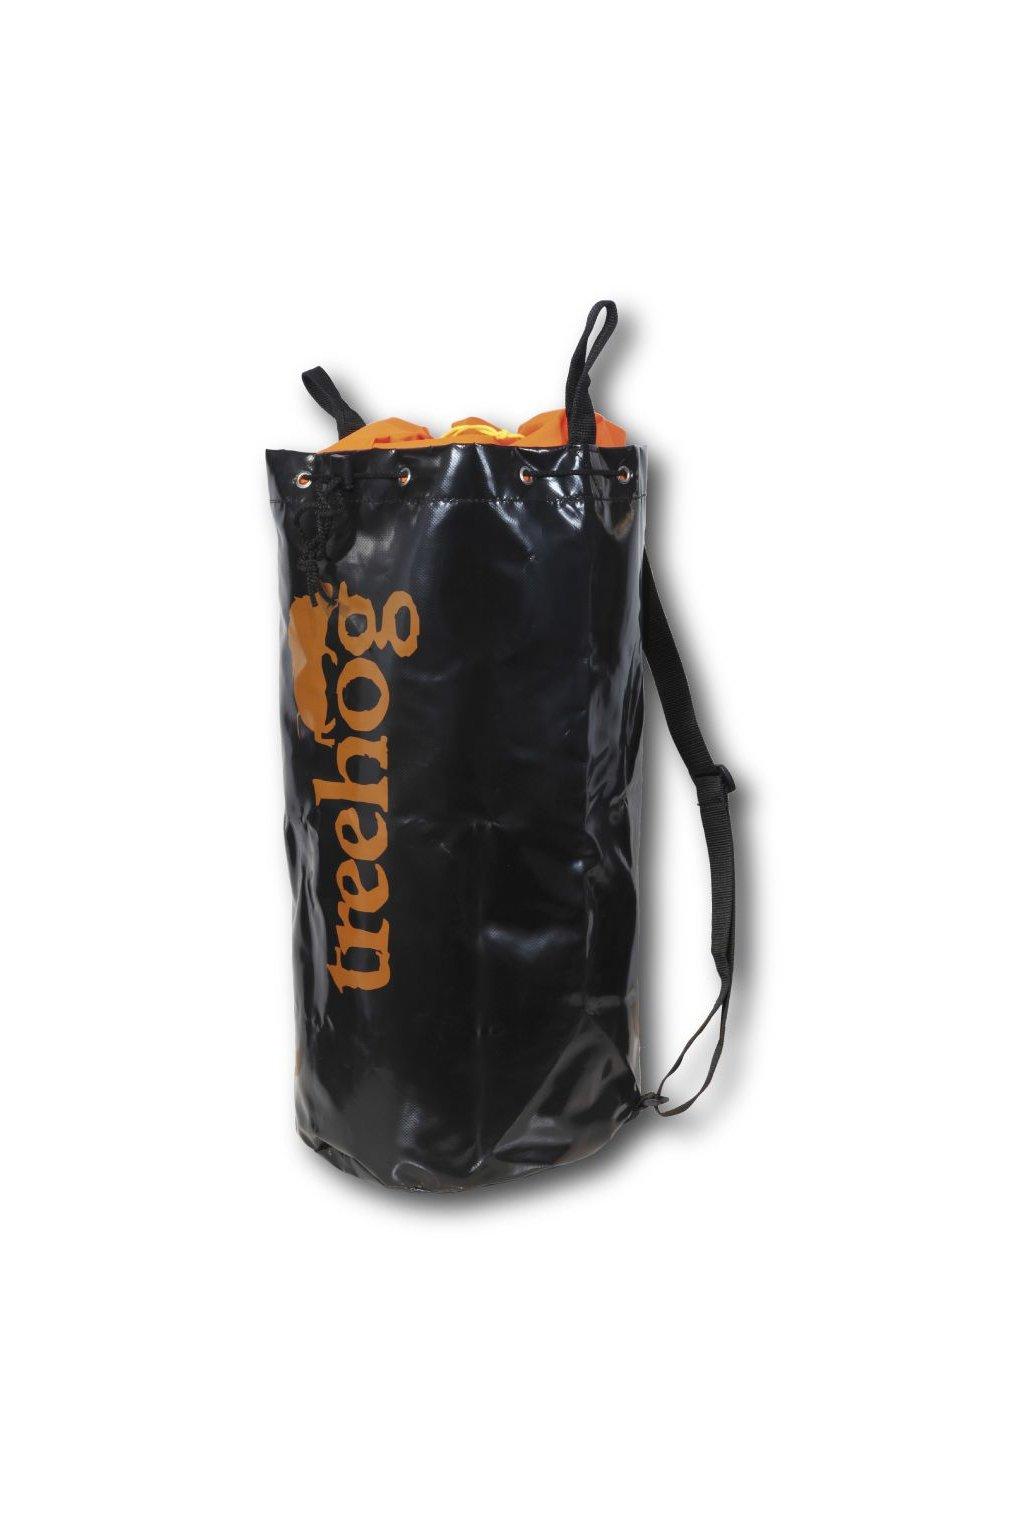 th4000 kit bag